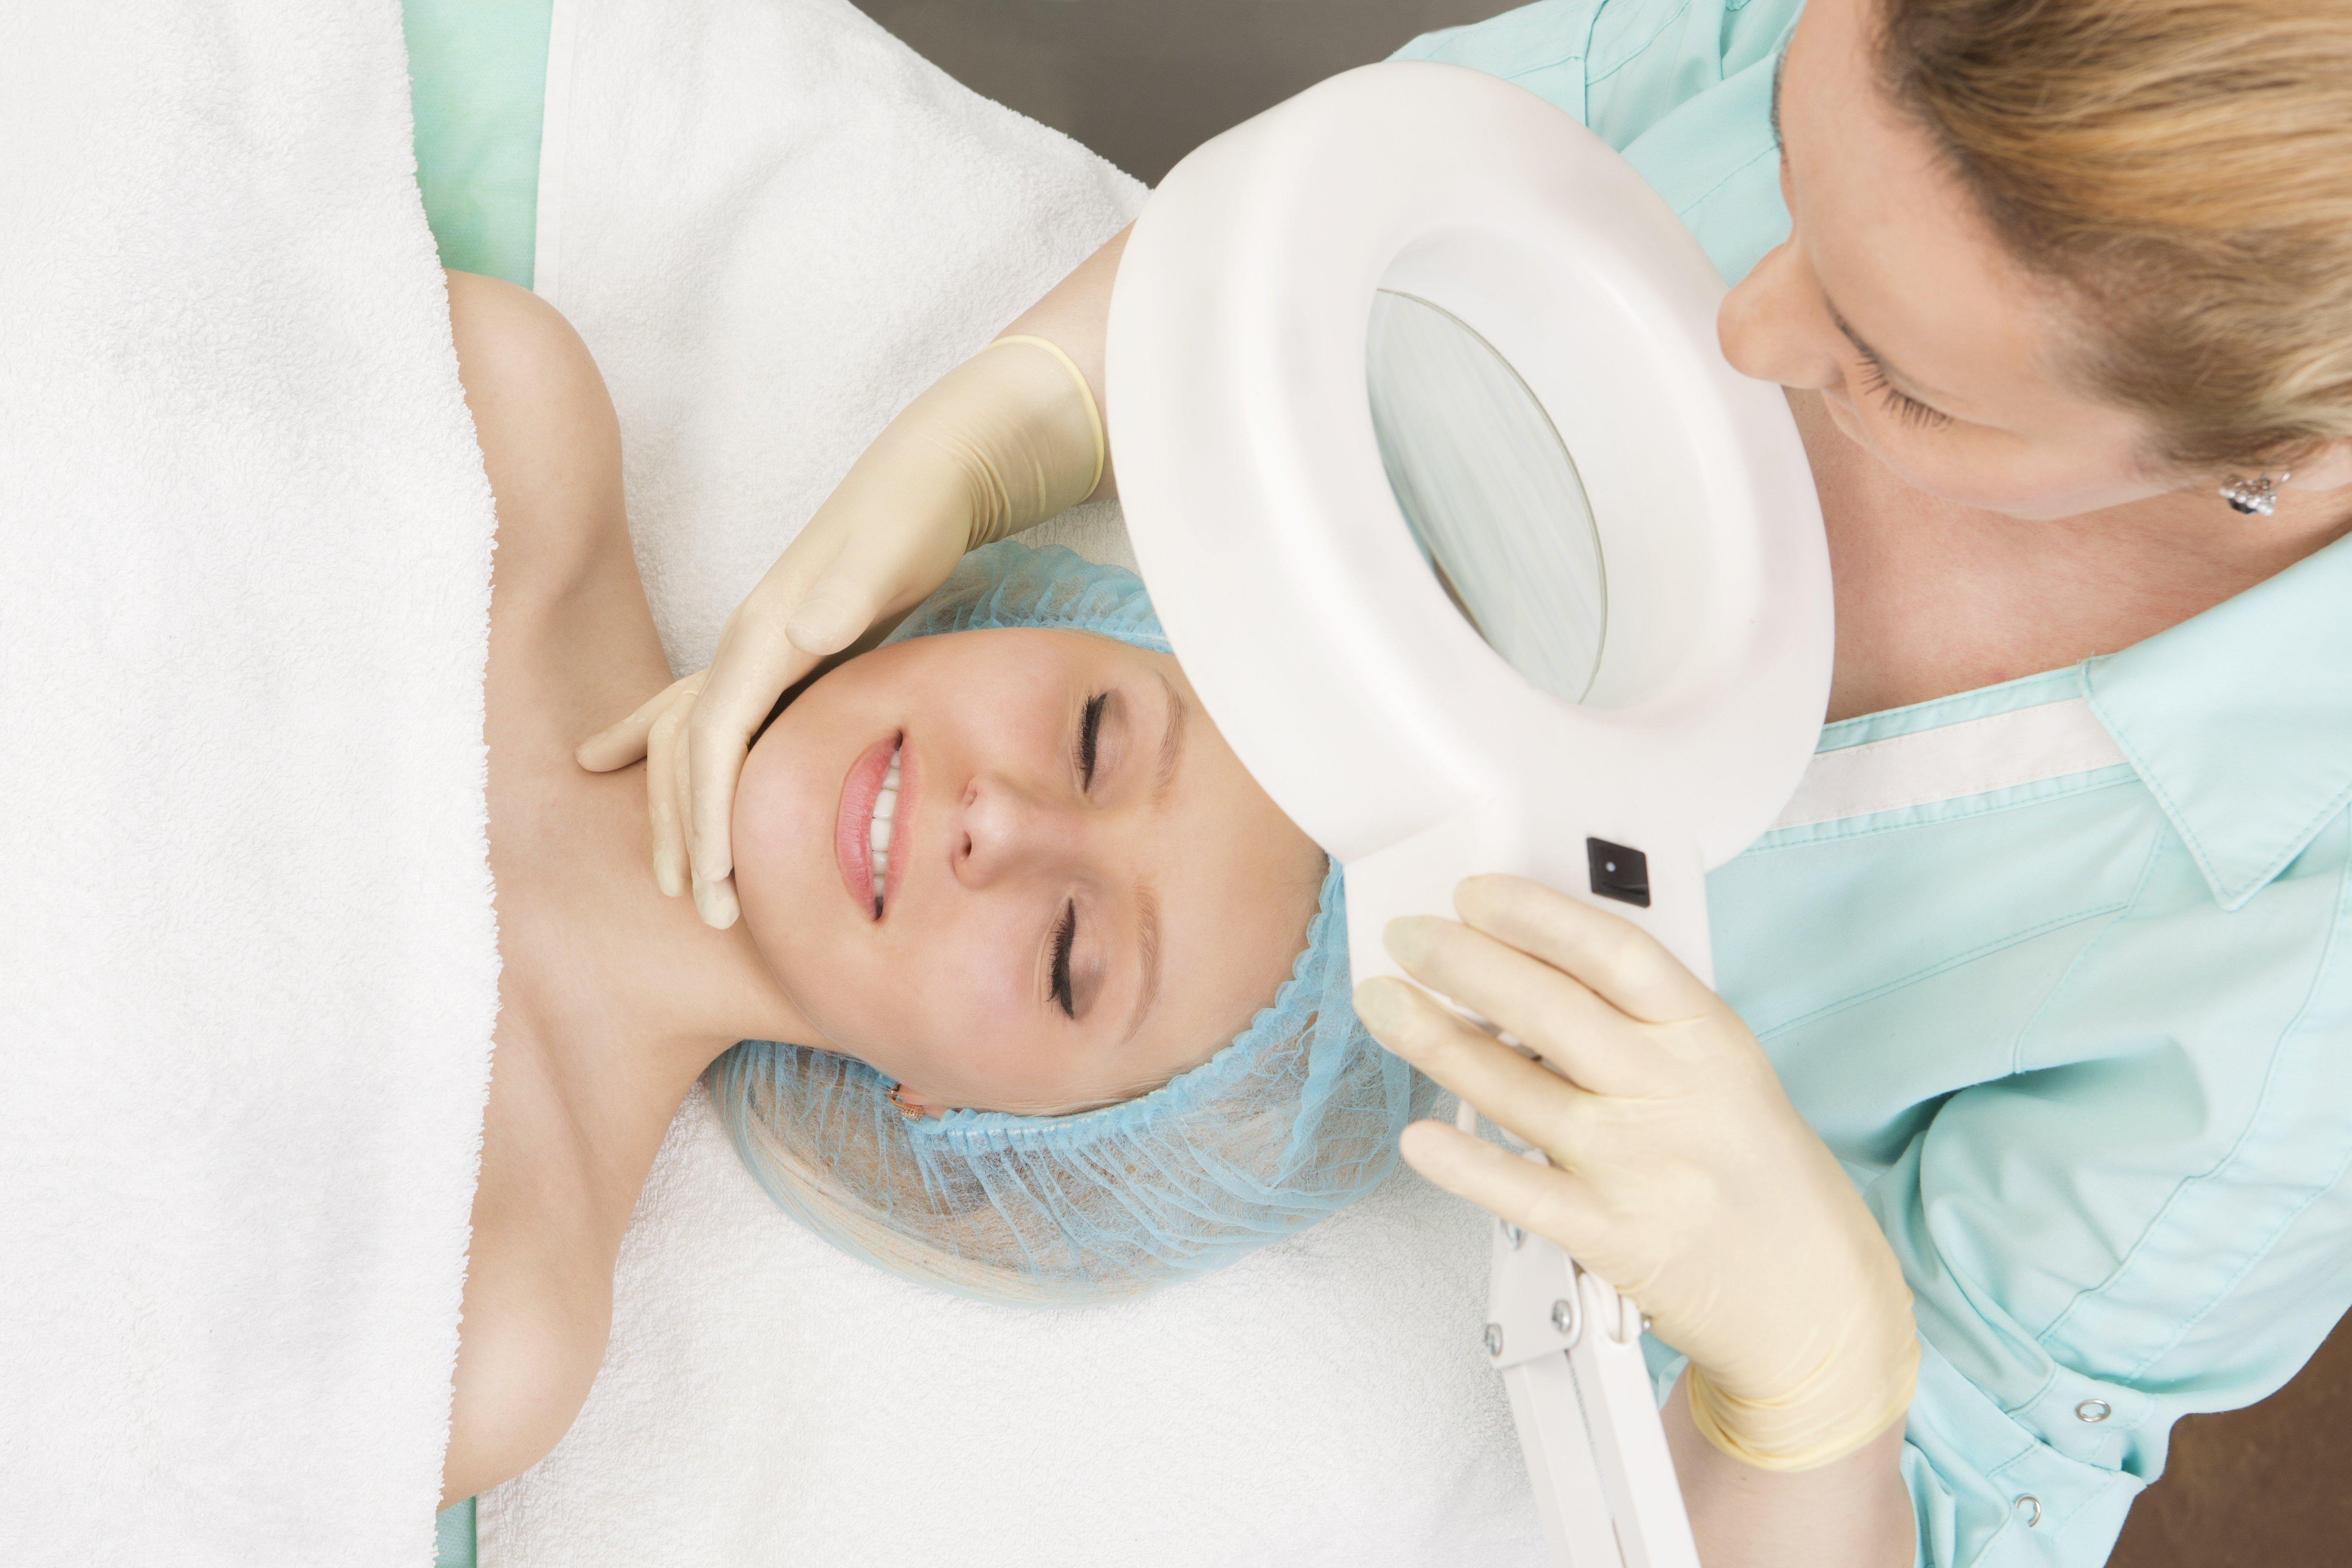 Woman gettingfacial hair removal treatment in Cincinnati, OH